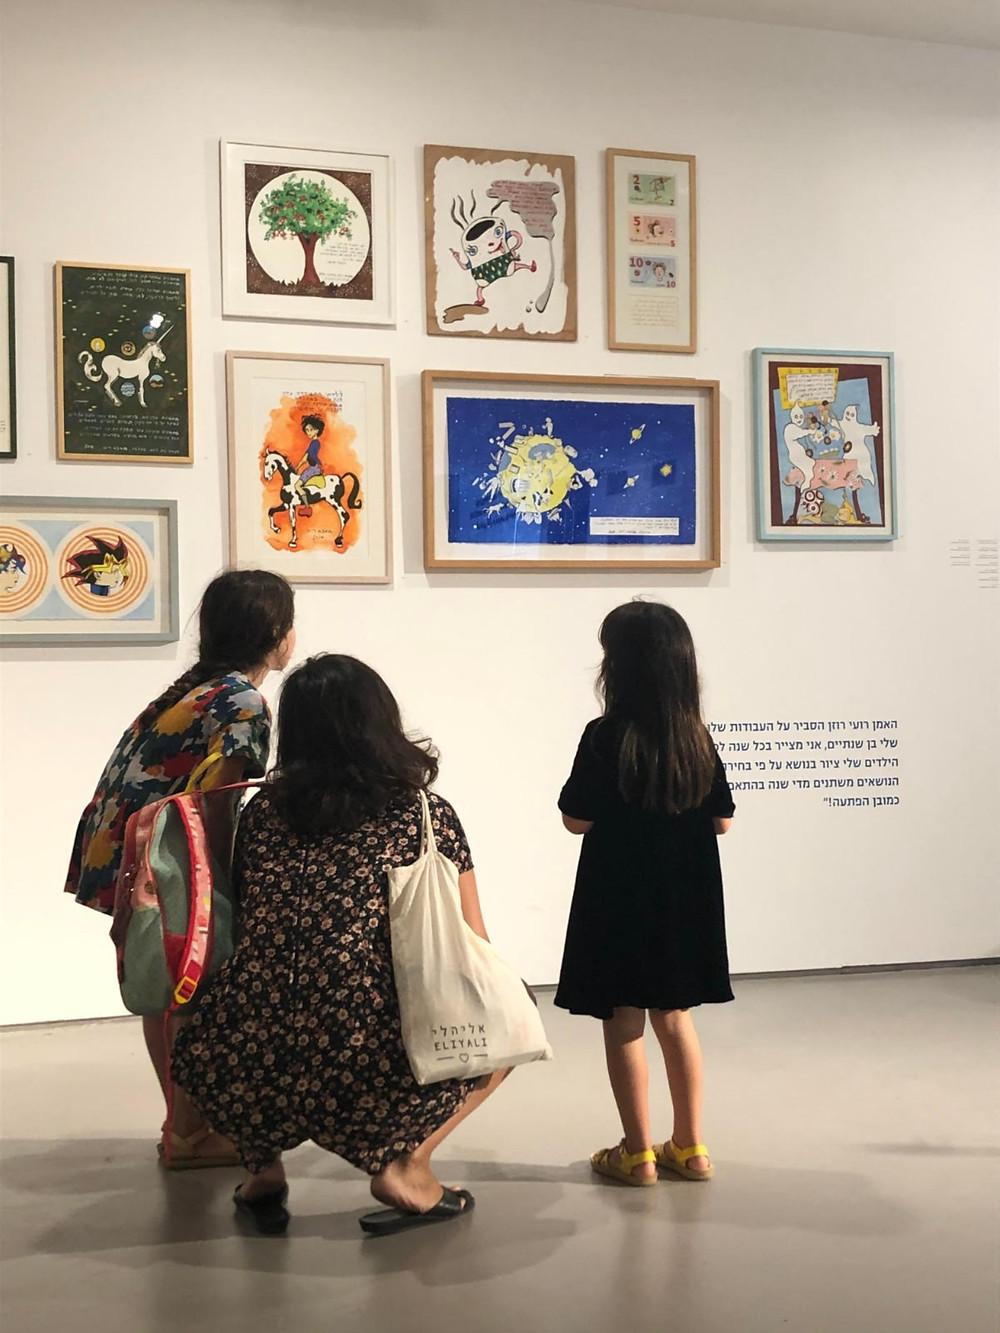 Passover 2021: Museum Activities for Children